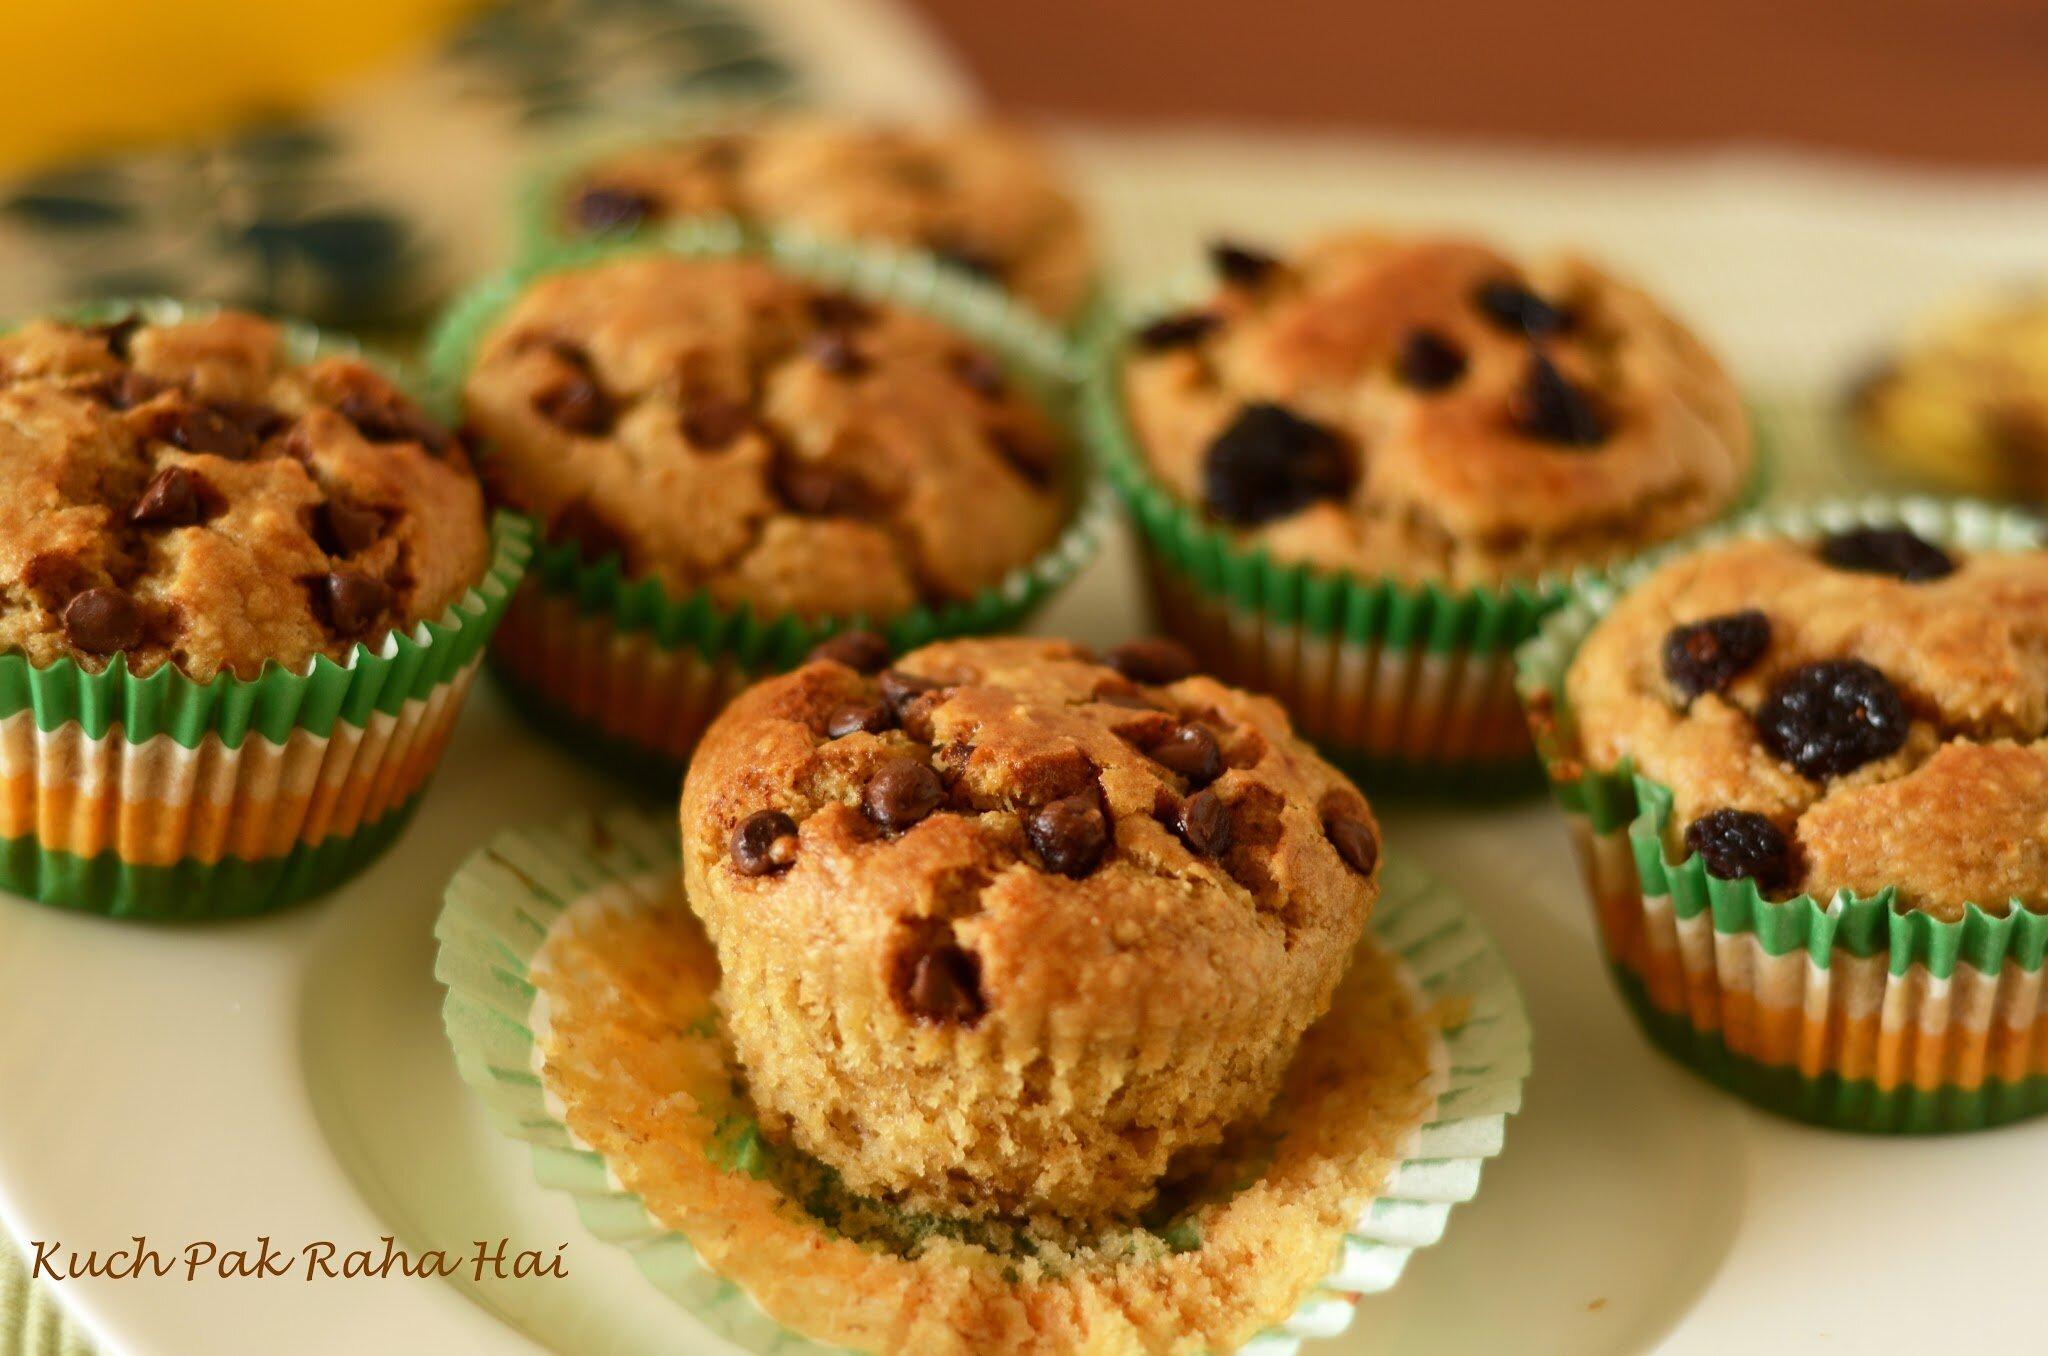 Eggless Banana Oats Muffins Recipe